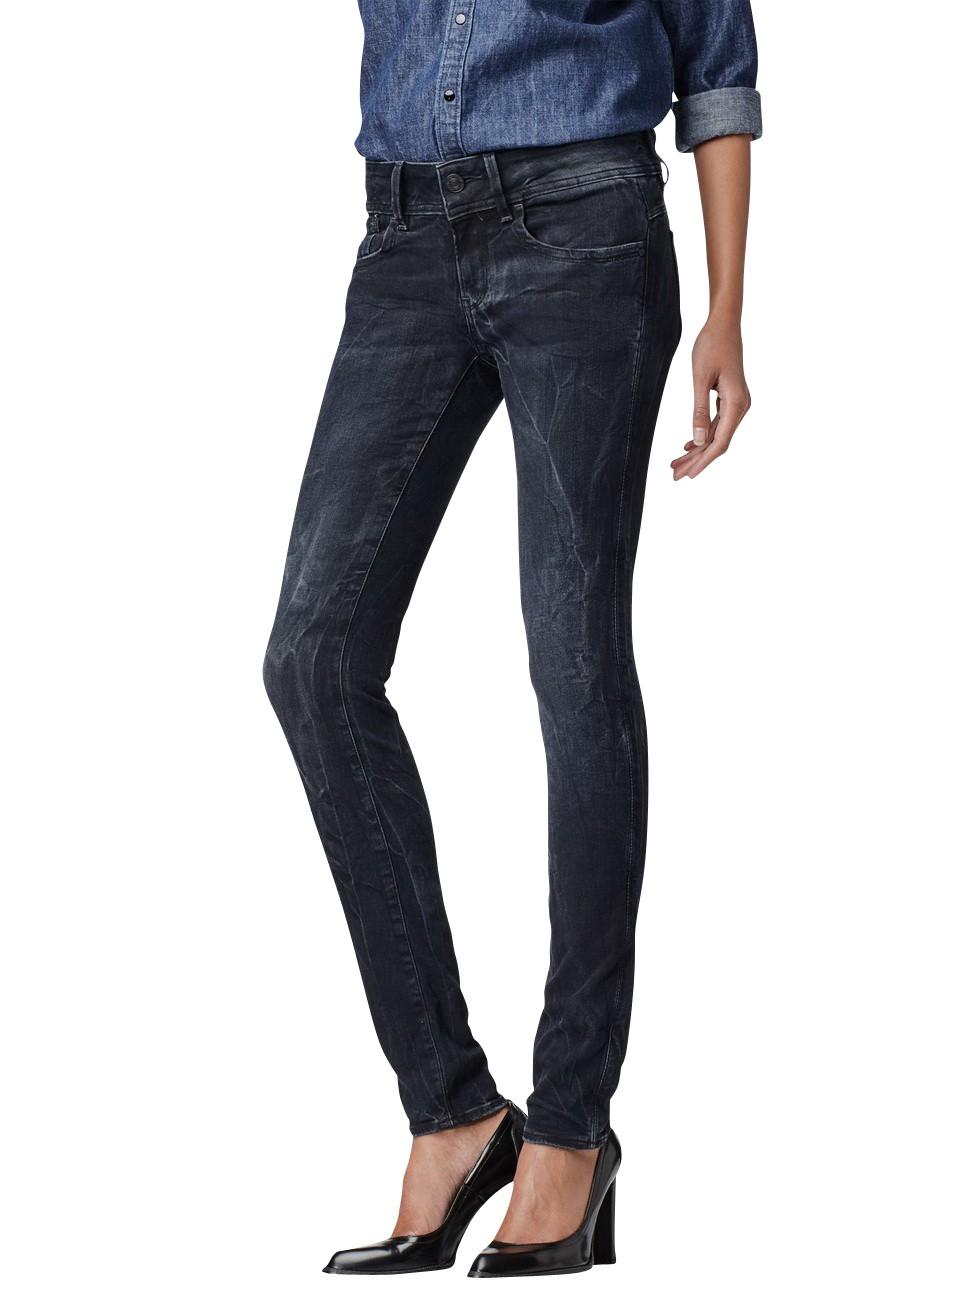 g star damen jeans lynn mid skinny dark aged kaufen. Black Bedroom Furniture Sets. Home Design Ideas